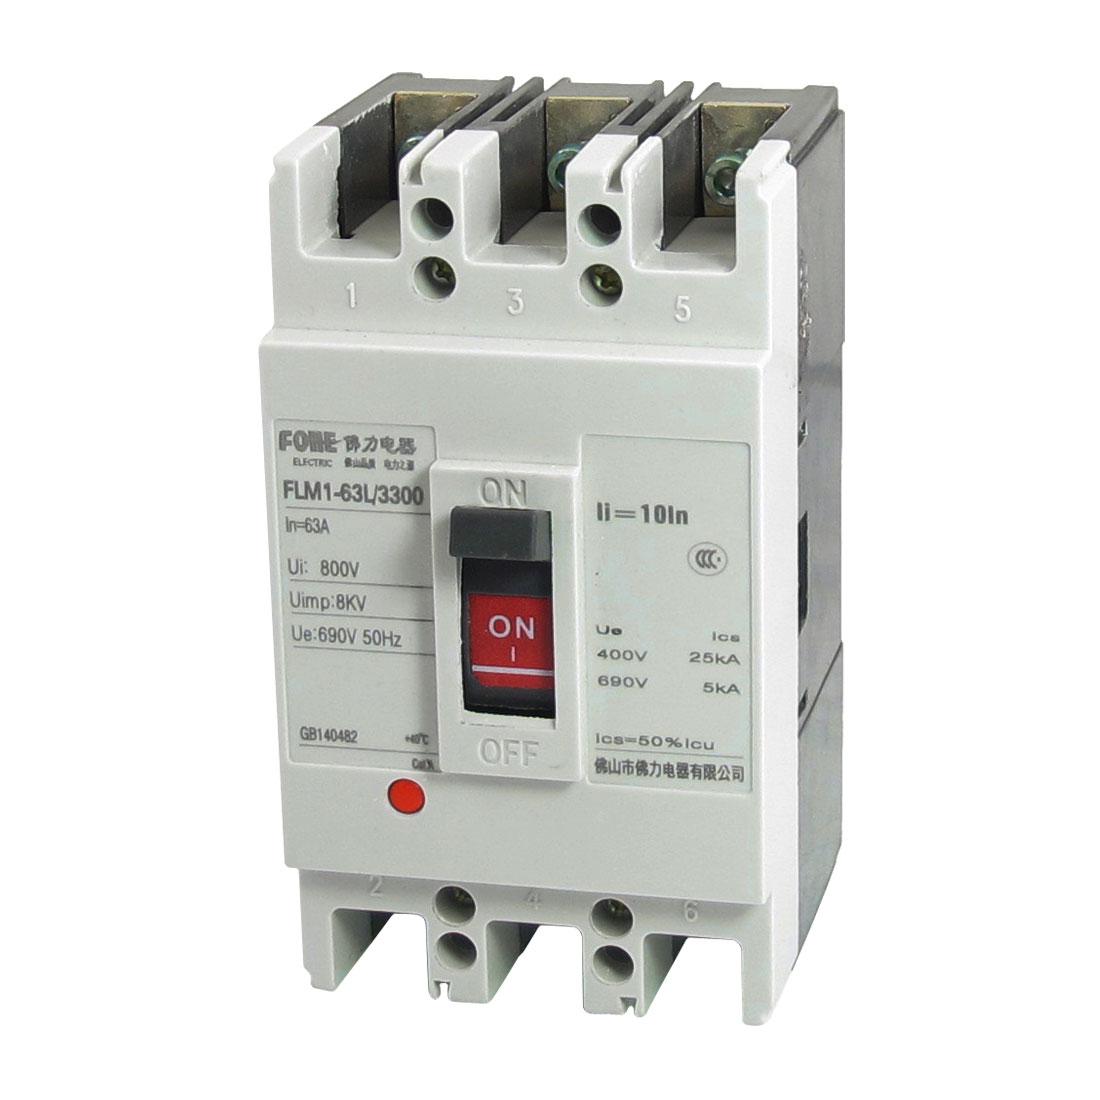 FLM1-63L/3300 MCCB Moulded Case Circuit Breaker 3 Poles 8KV 63A 690V AC